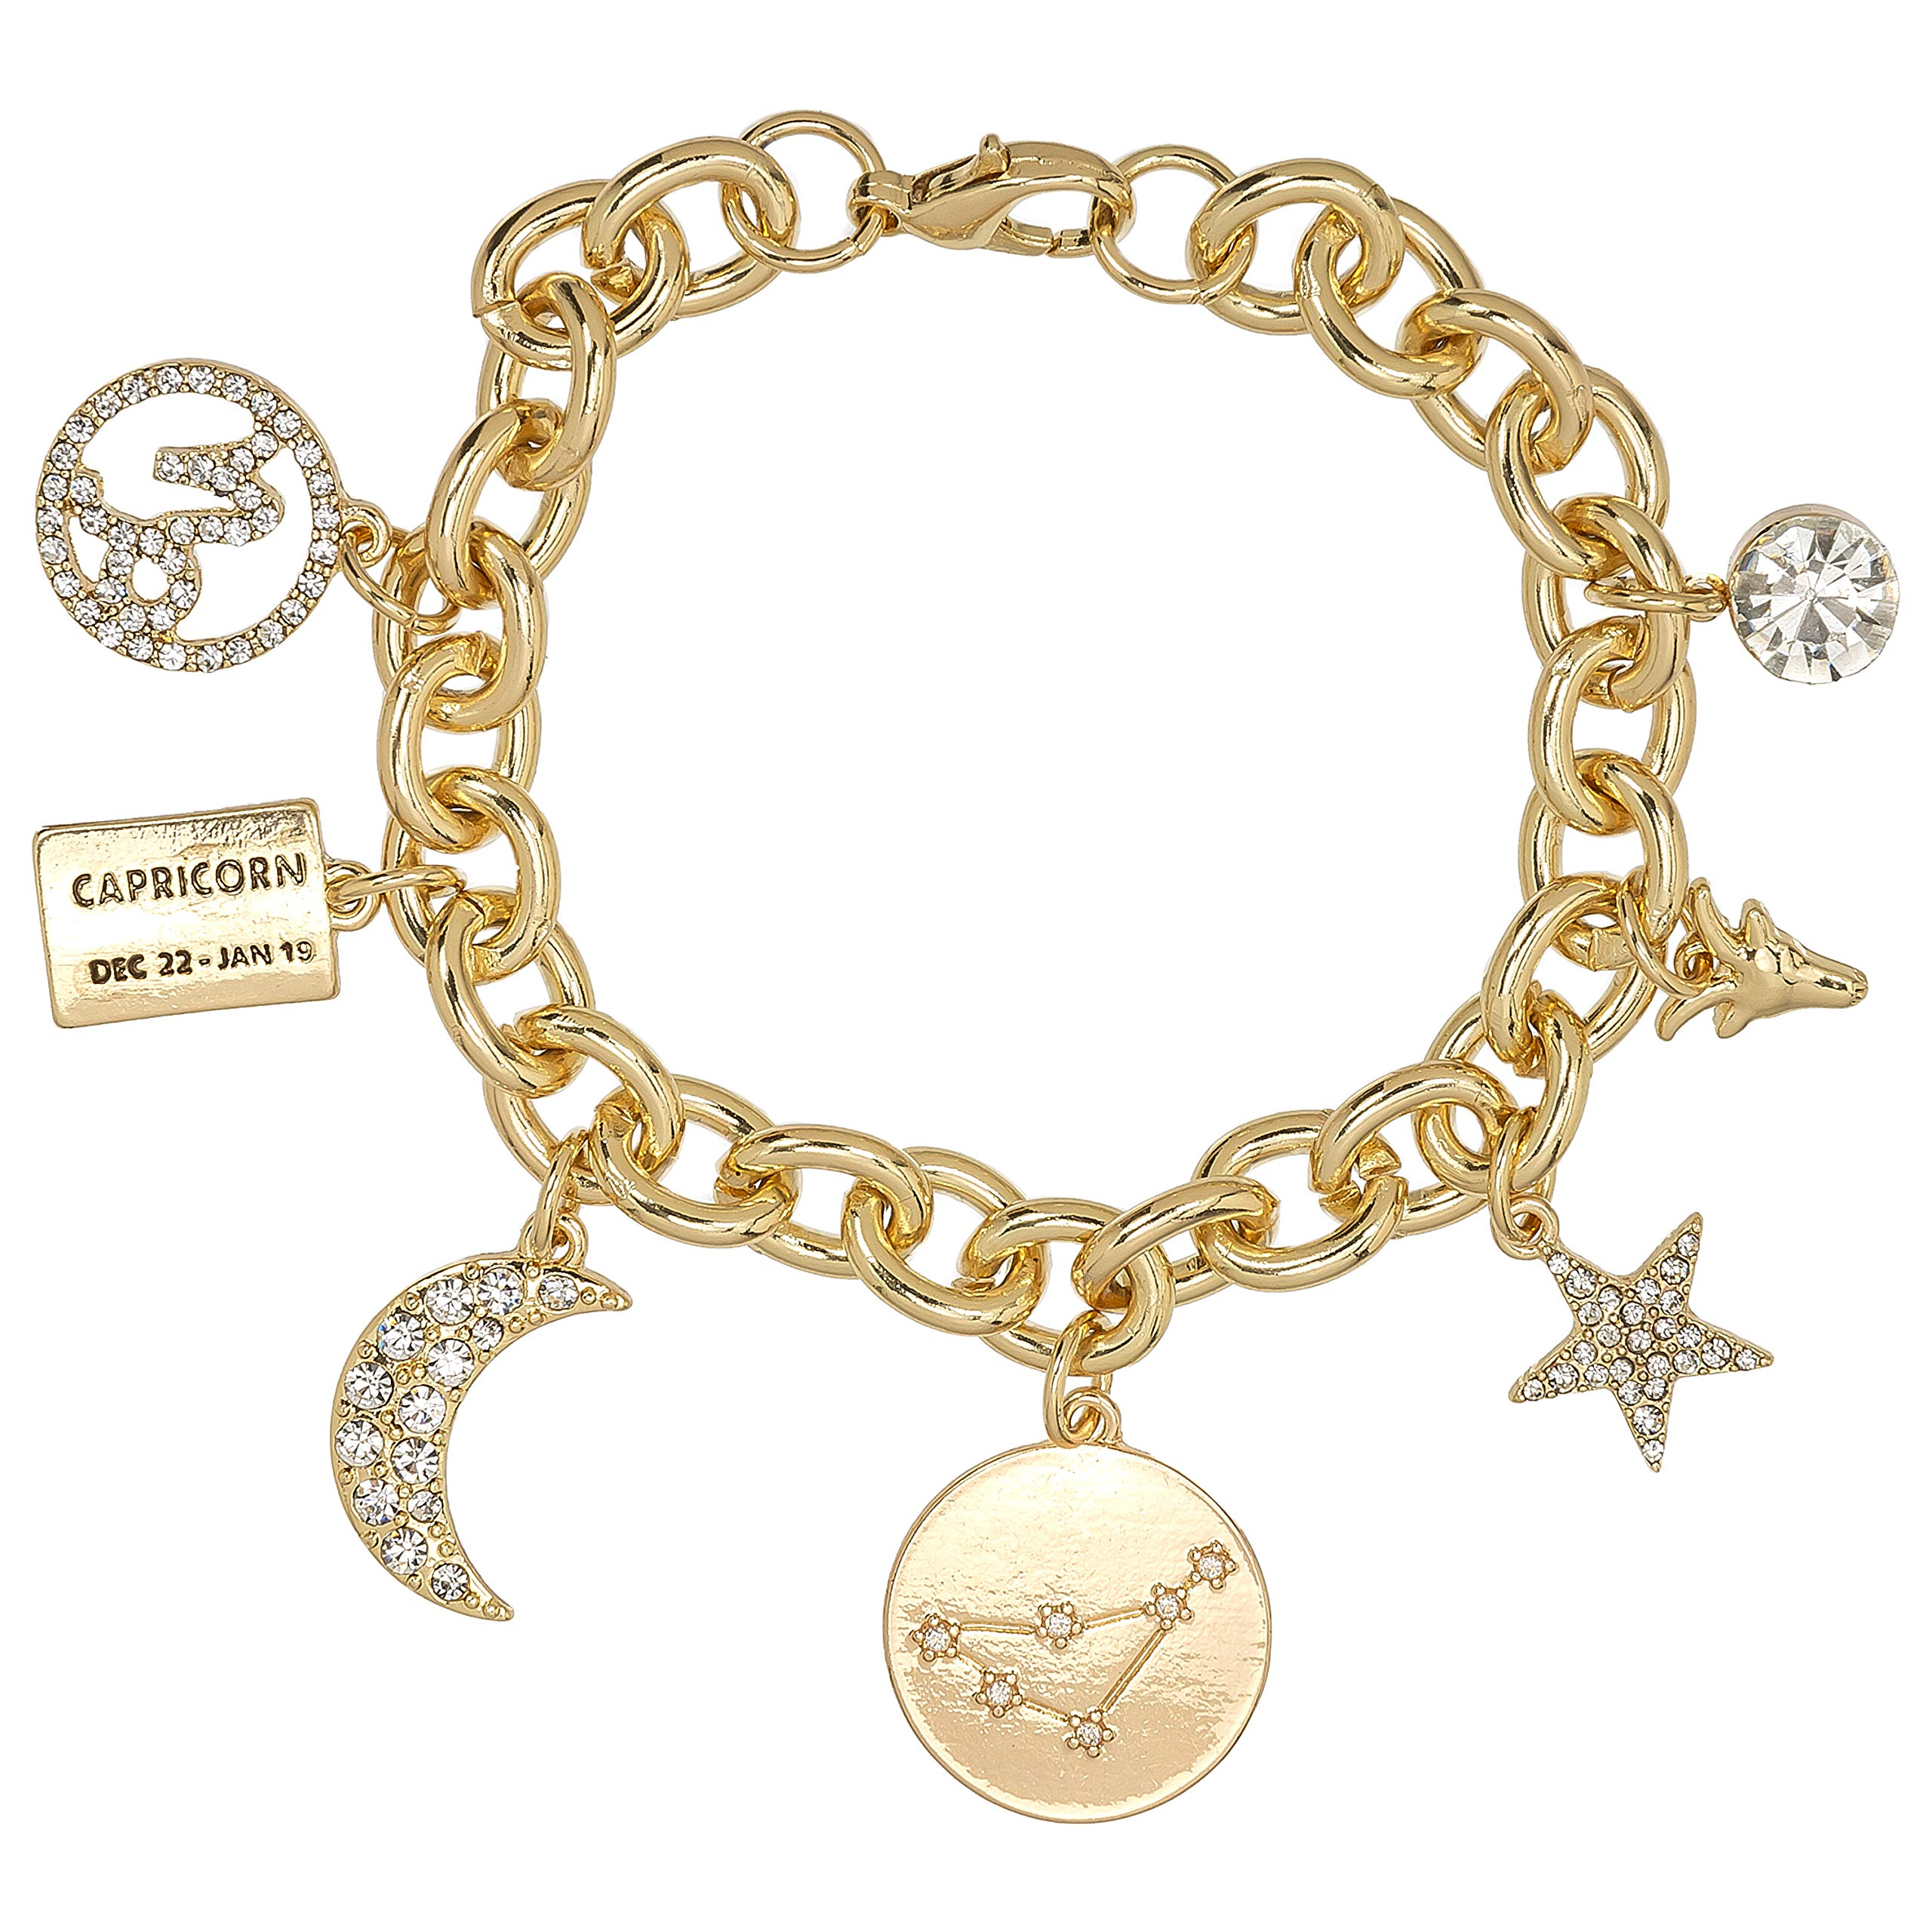 SALE ~ Gemini Twins Rhinestone Charm Silver Plated Lined Bangle Bracelet 7.5 Inches